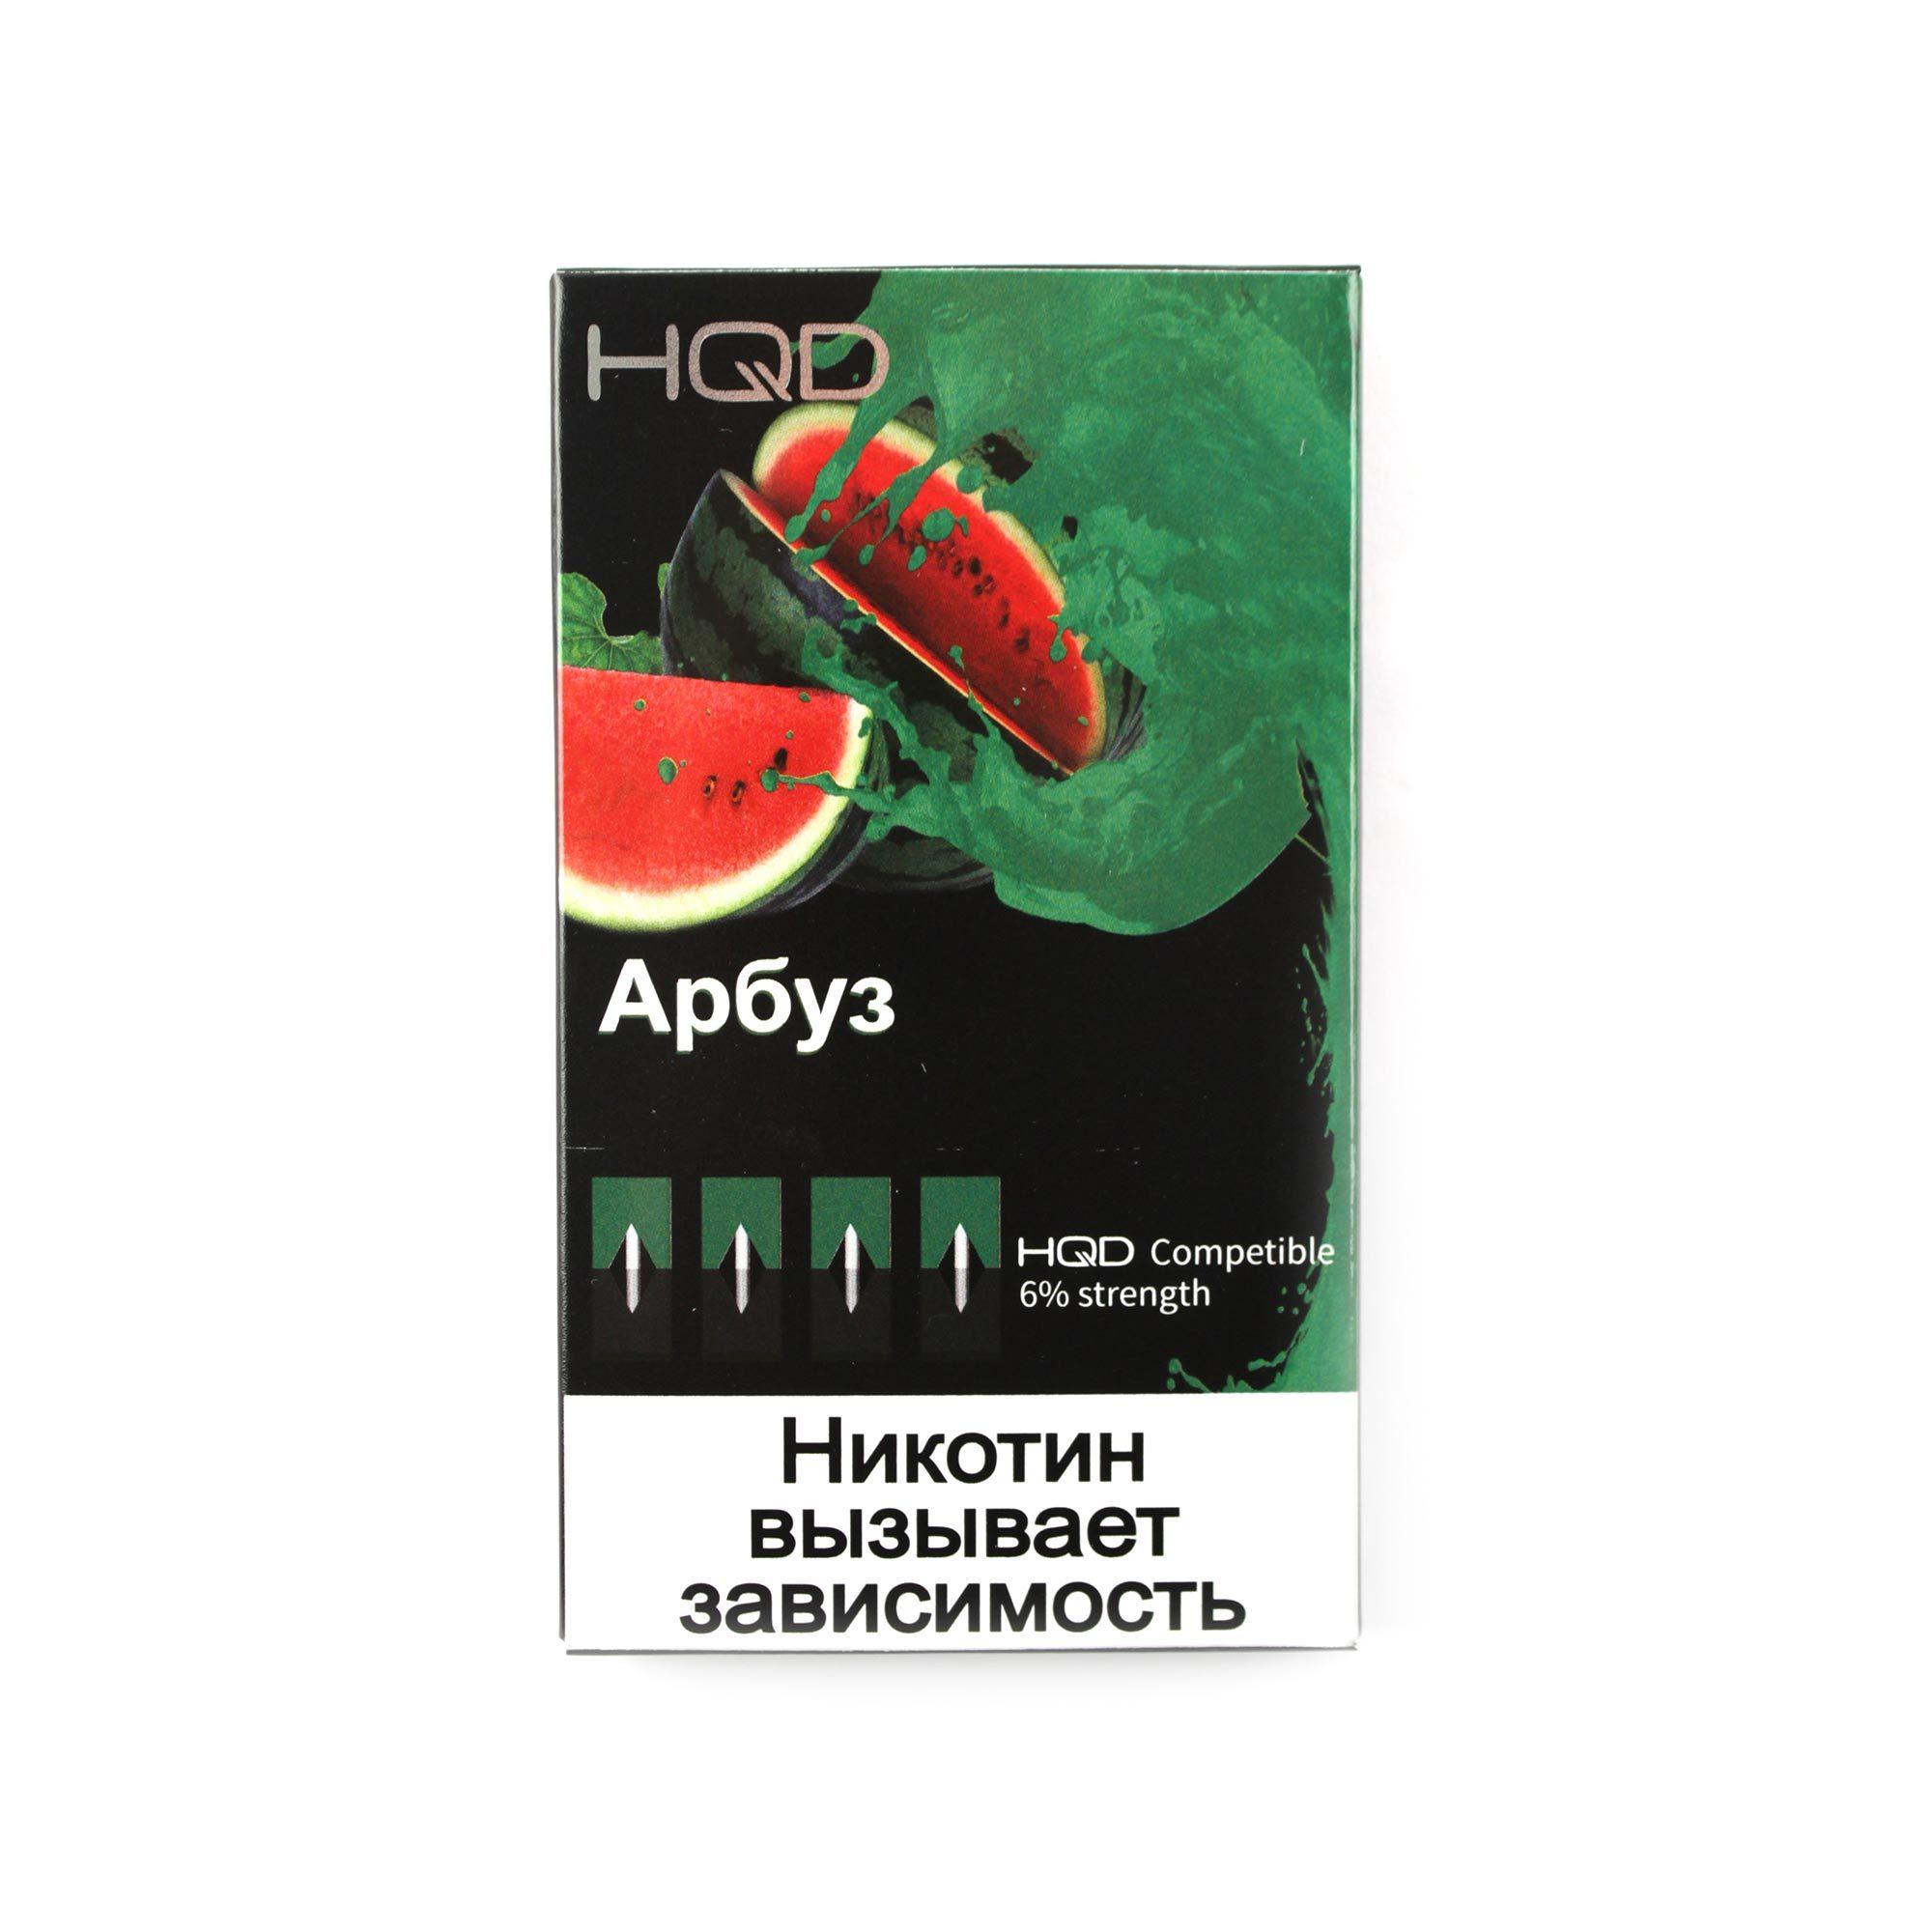 Сменный Картридж совместимый с JUUL HQD - Арбуз х4, 60 мг